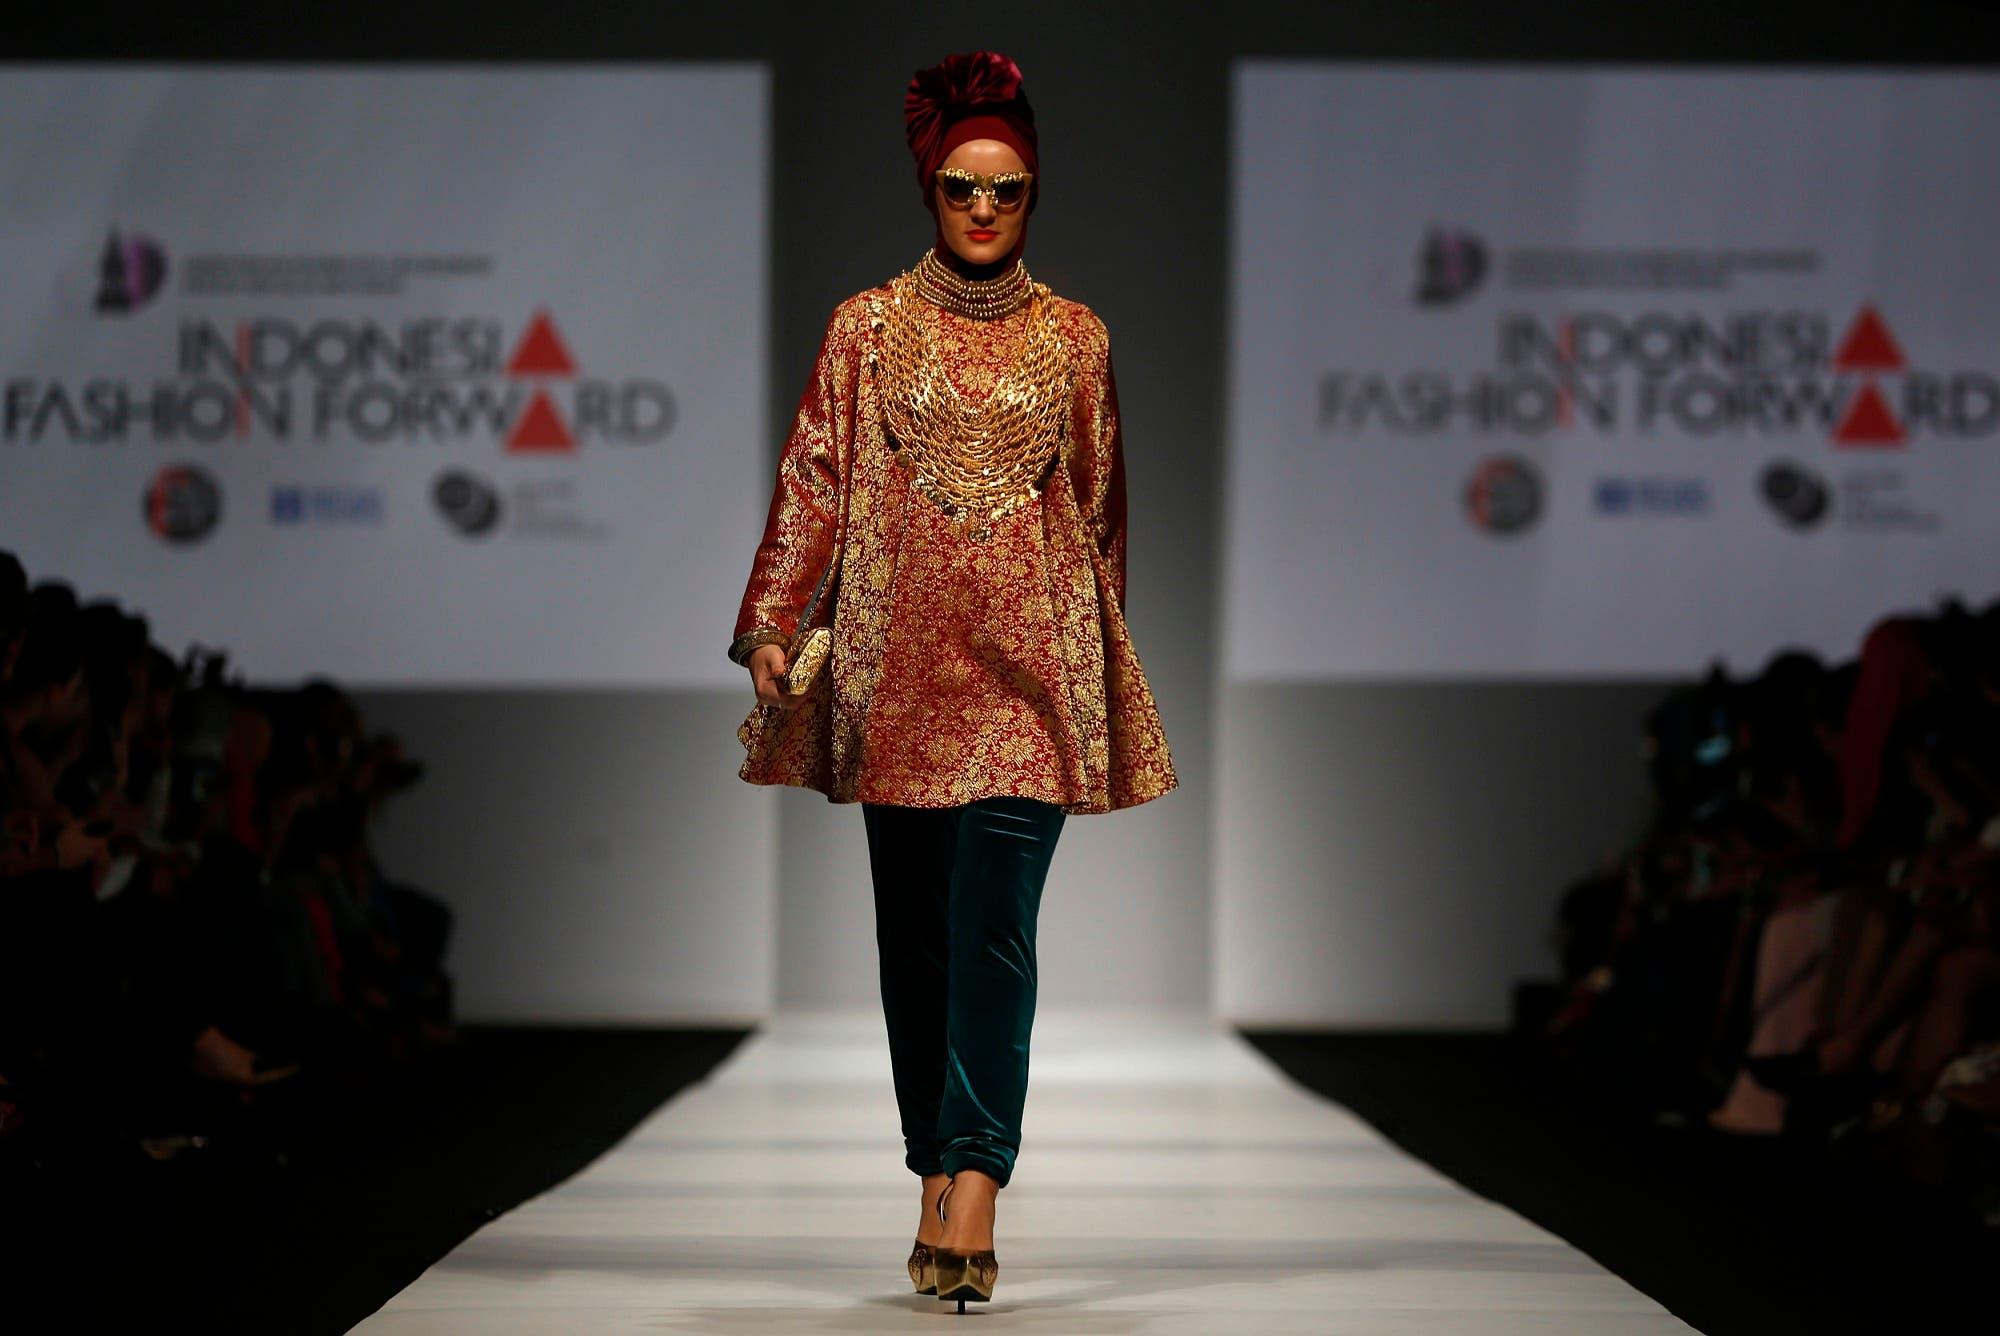 A model presents Muslim wear by Indonesian designer Dian Pelangi during Jakarta Fashion Week November 1, 2014. (Reuters)